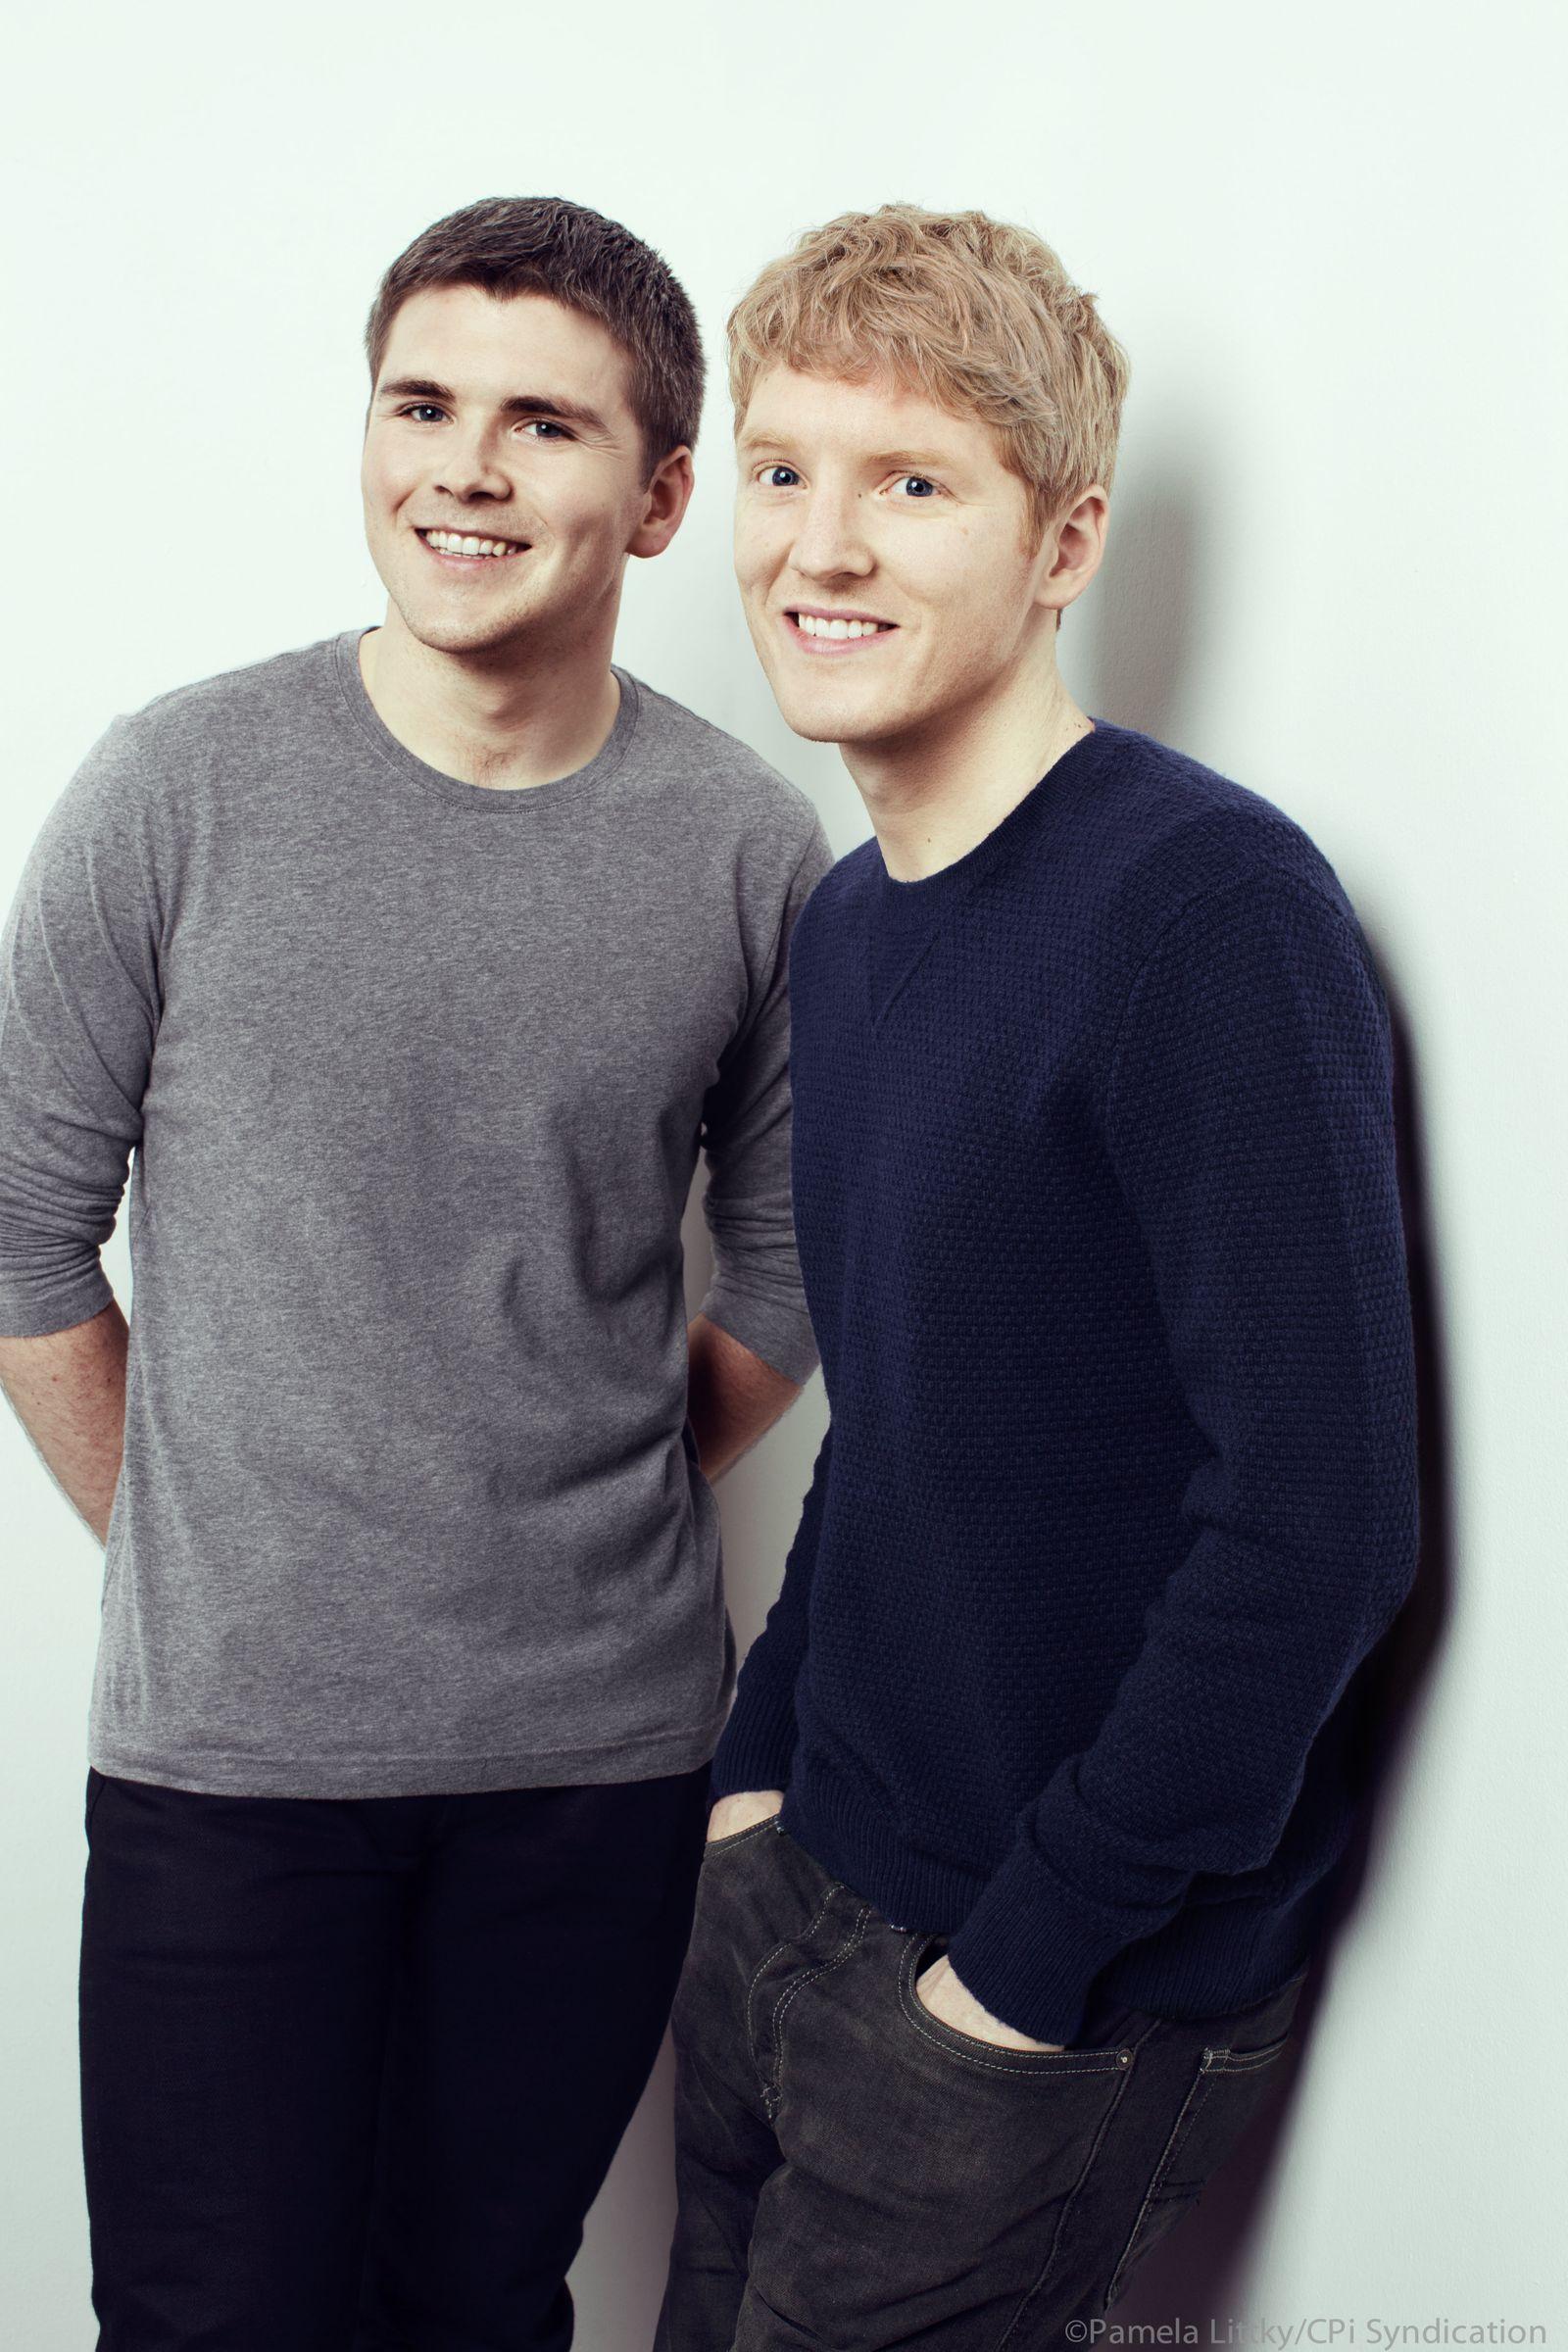 Patrick_and_John_Collison_2